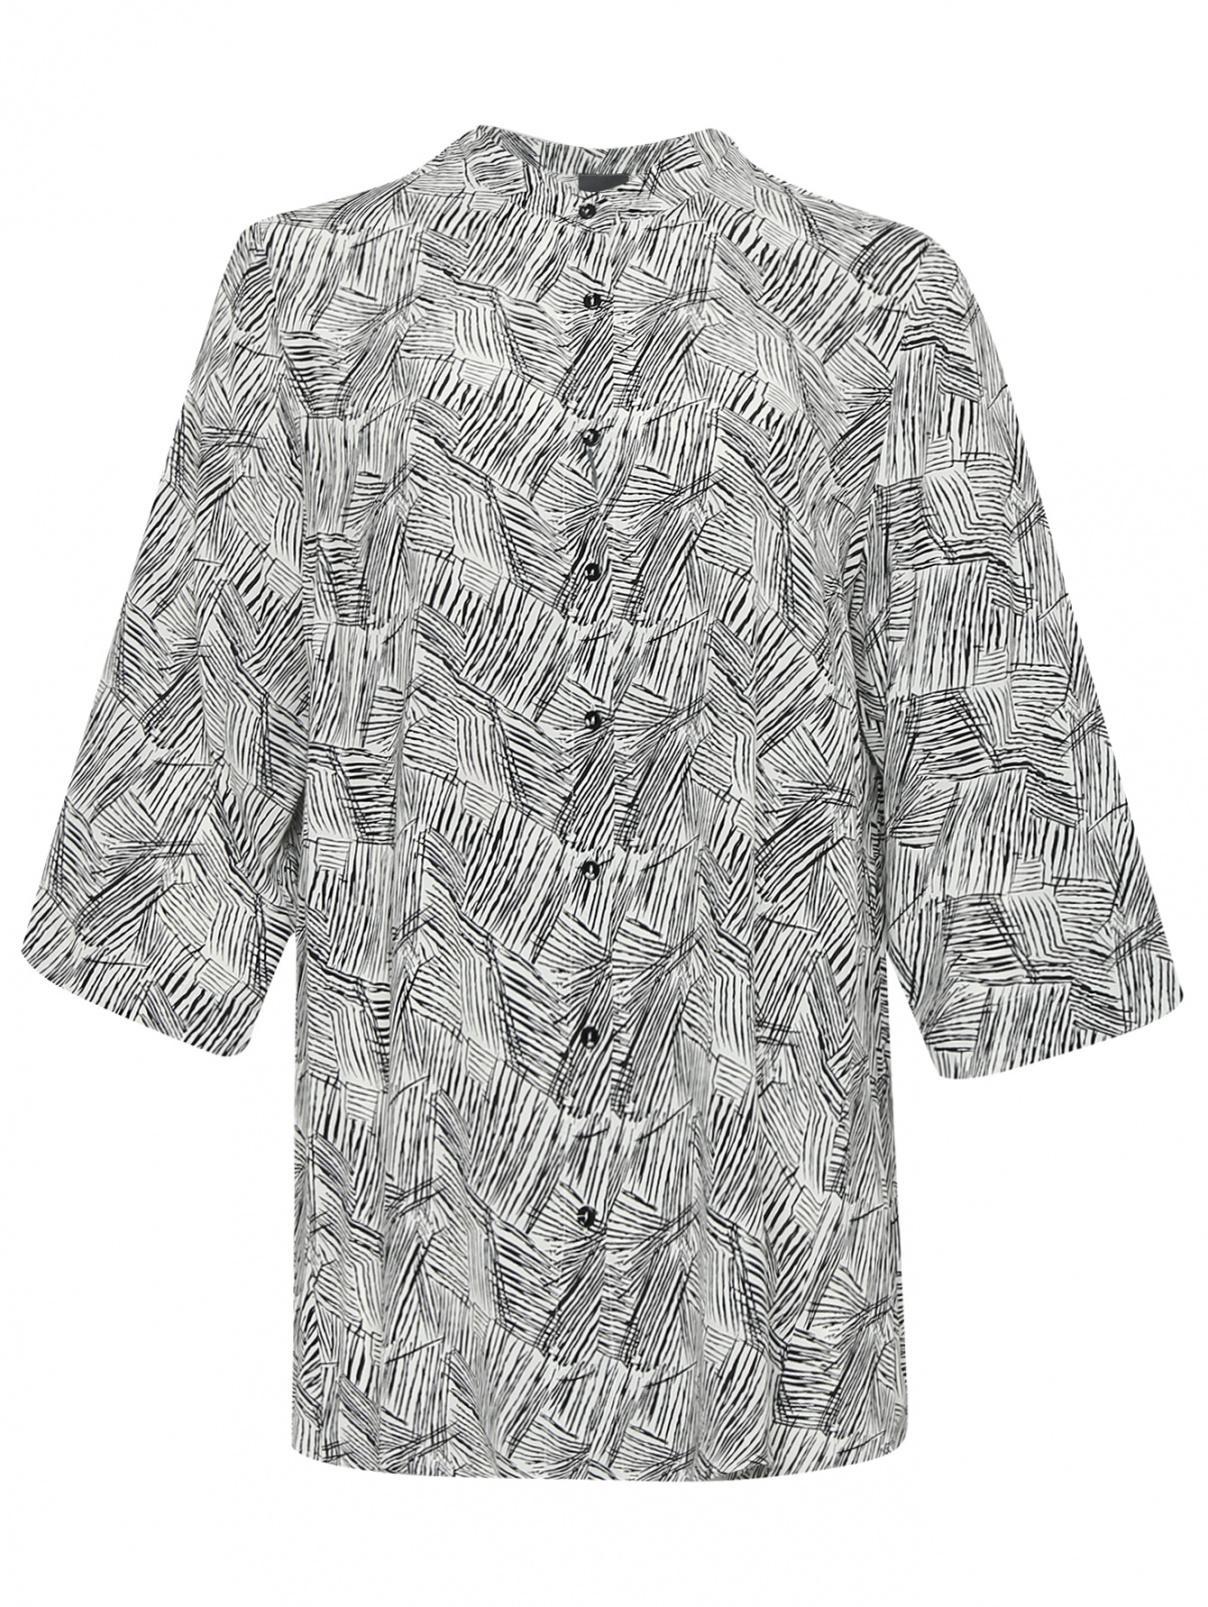 Блуза свободного кроя с узором Persona by Marina Rinaldi  –  Общий вид